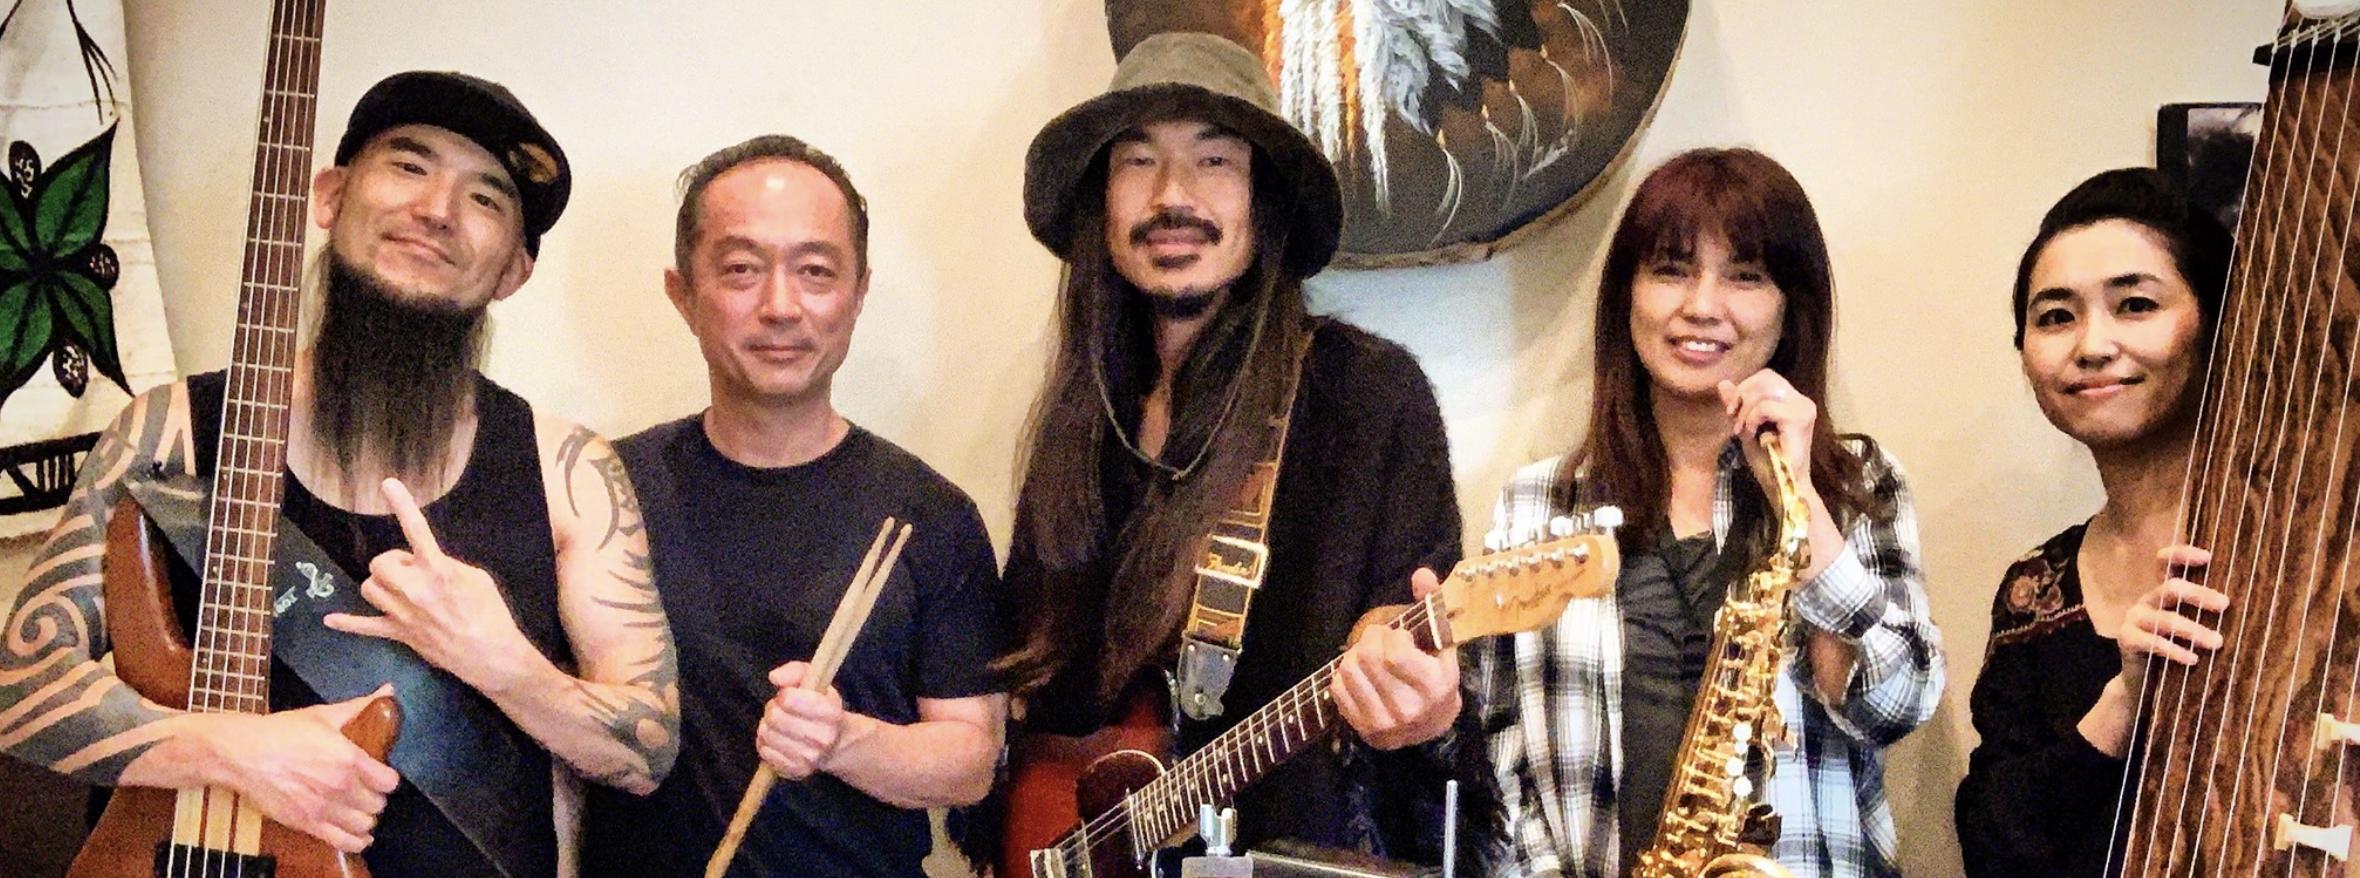 UMAMIX - Rock band UMAMIX blends the ancient sound of the Japanese koto, guitar, bass, drums, and saxophone.